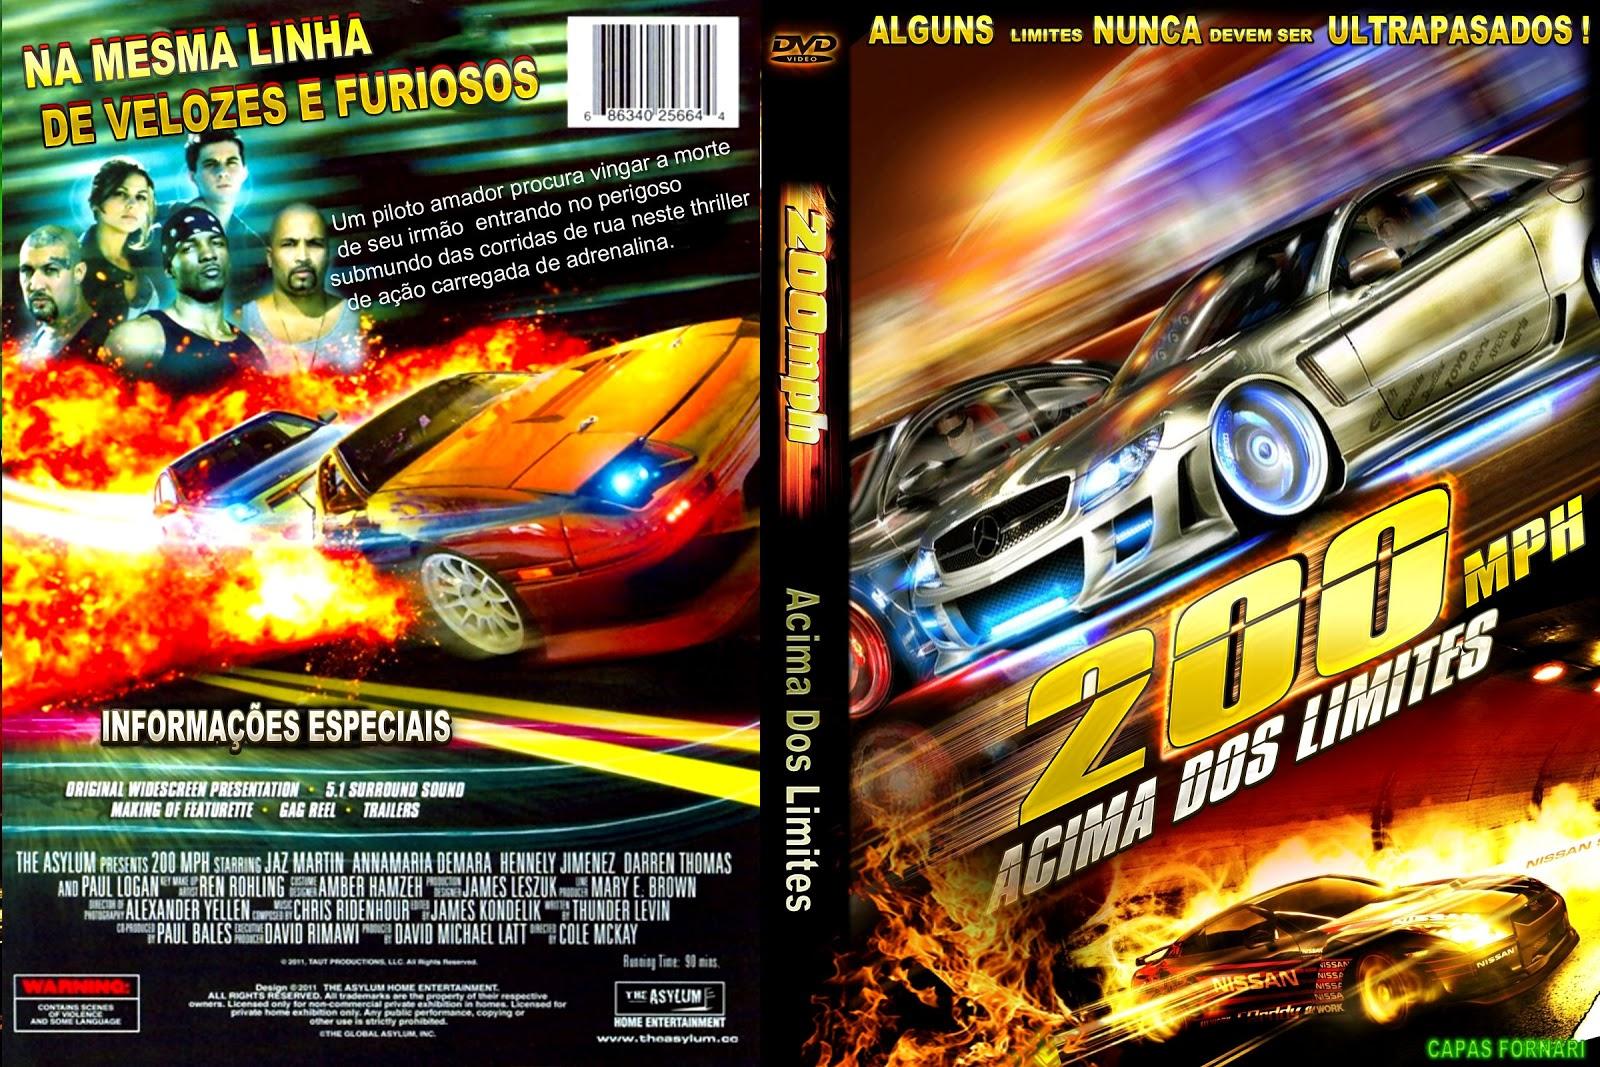 200 Mph Movie HD free download 720p